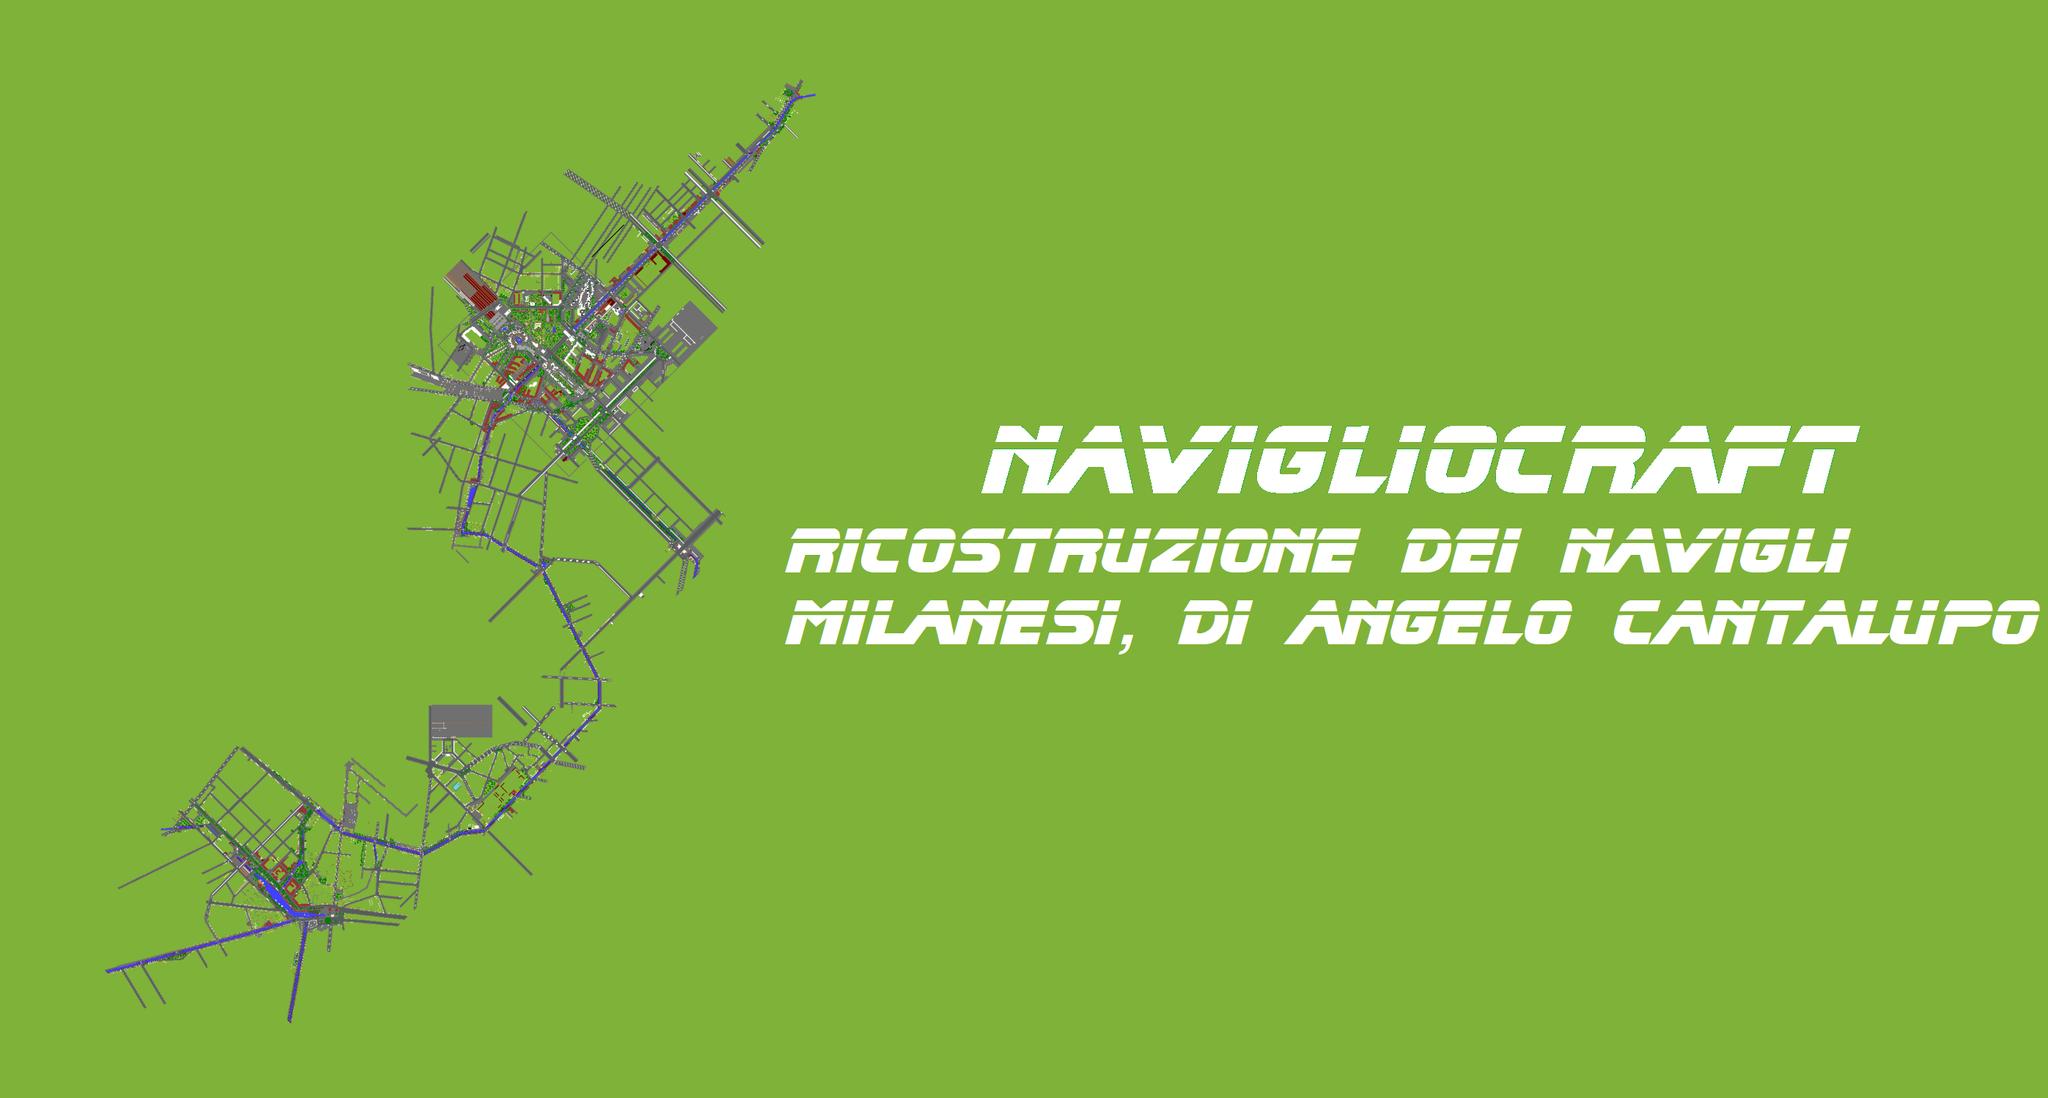 NaviglioCraft